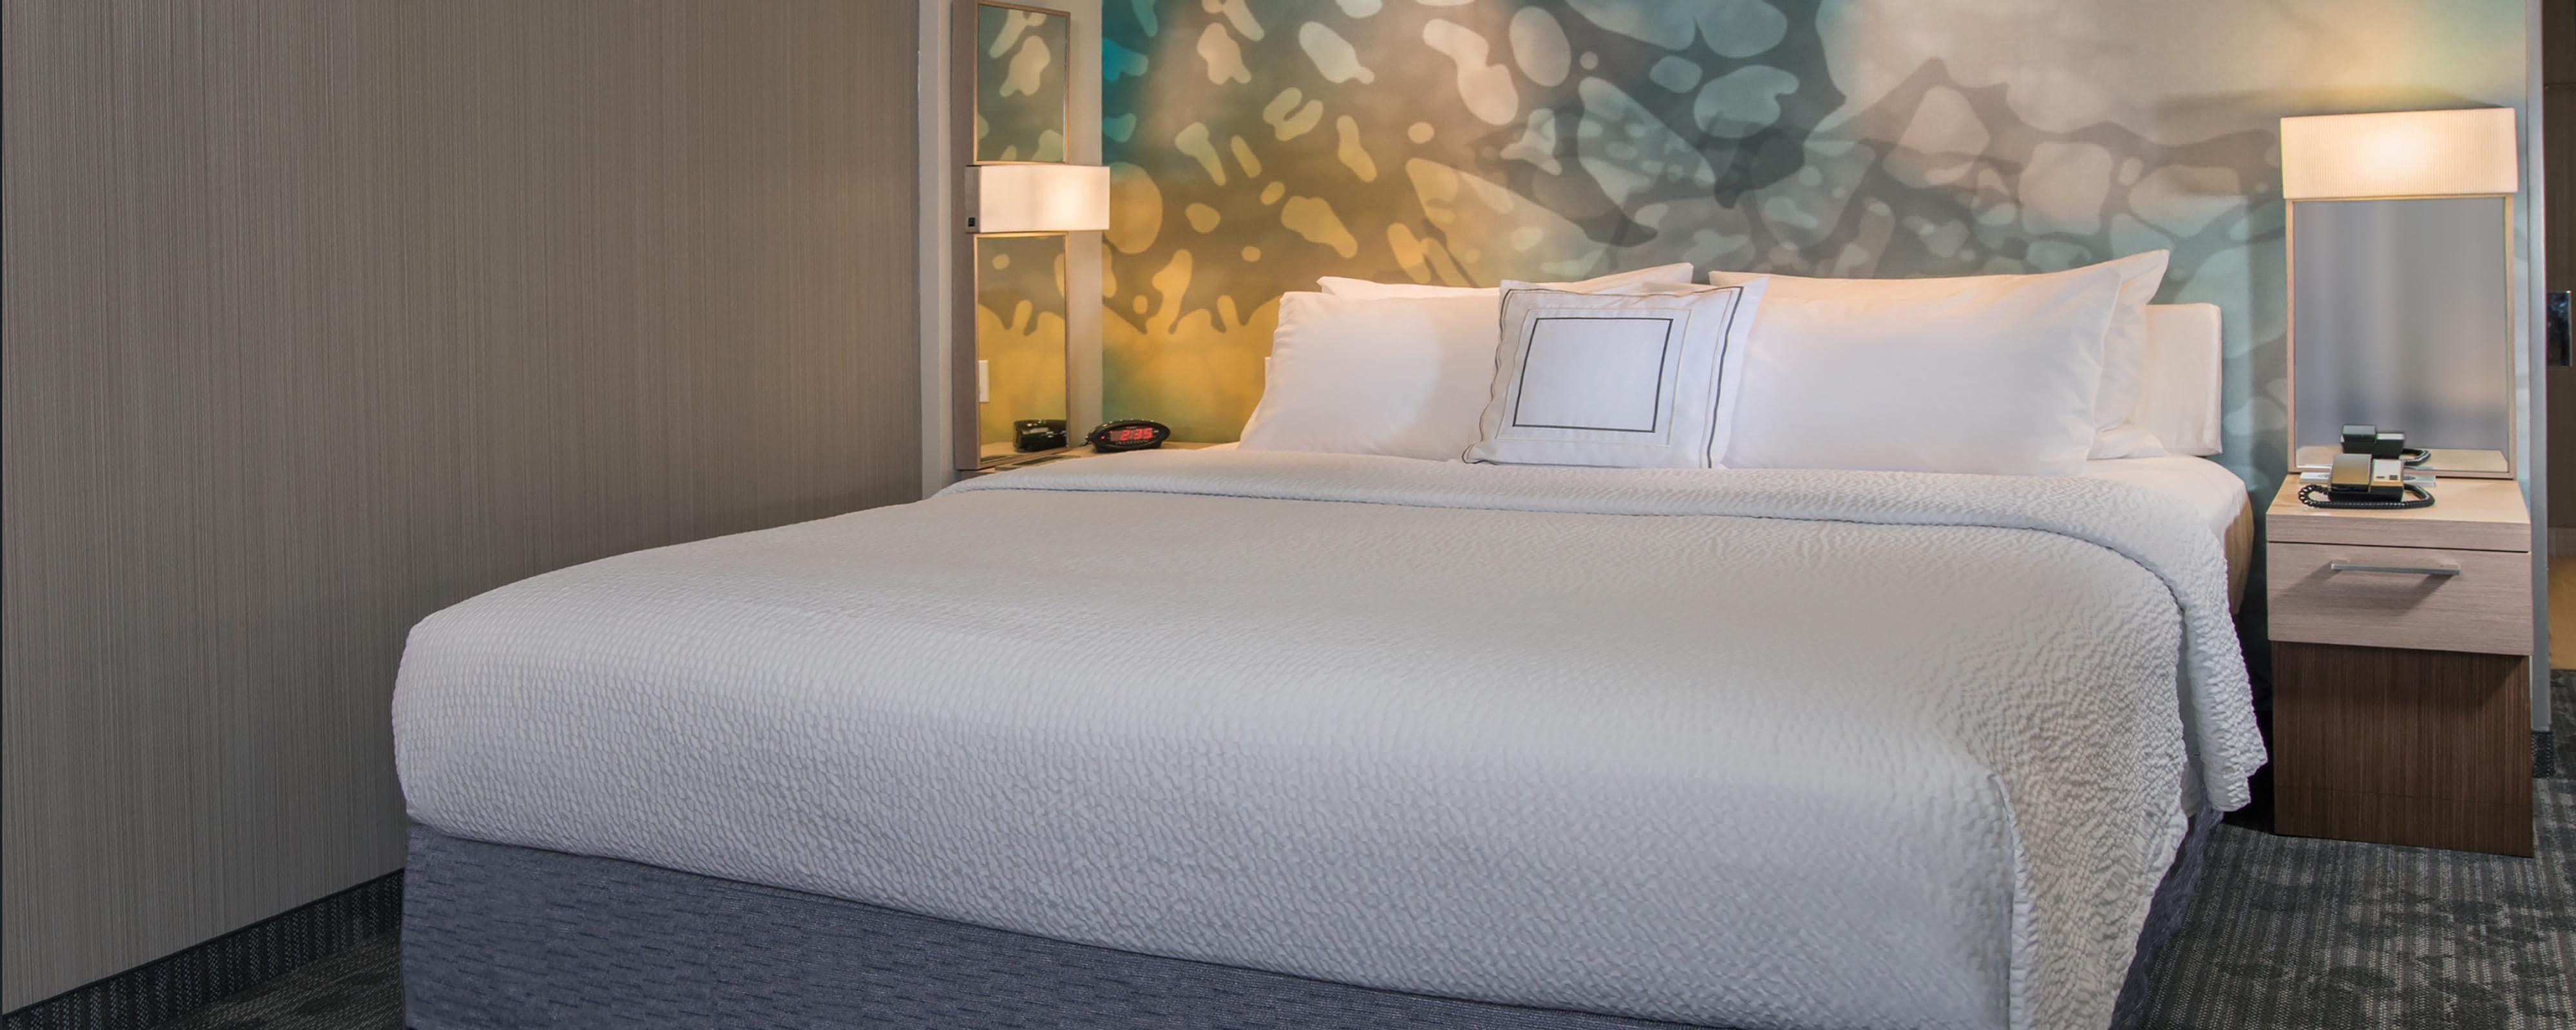 Courtyard Hotel King Guest Room Sleeping Area